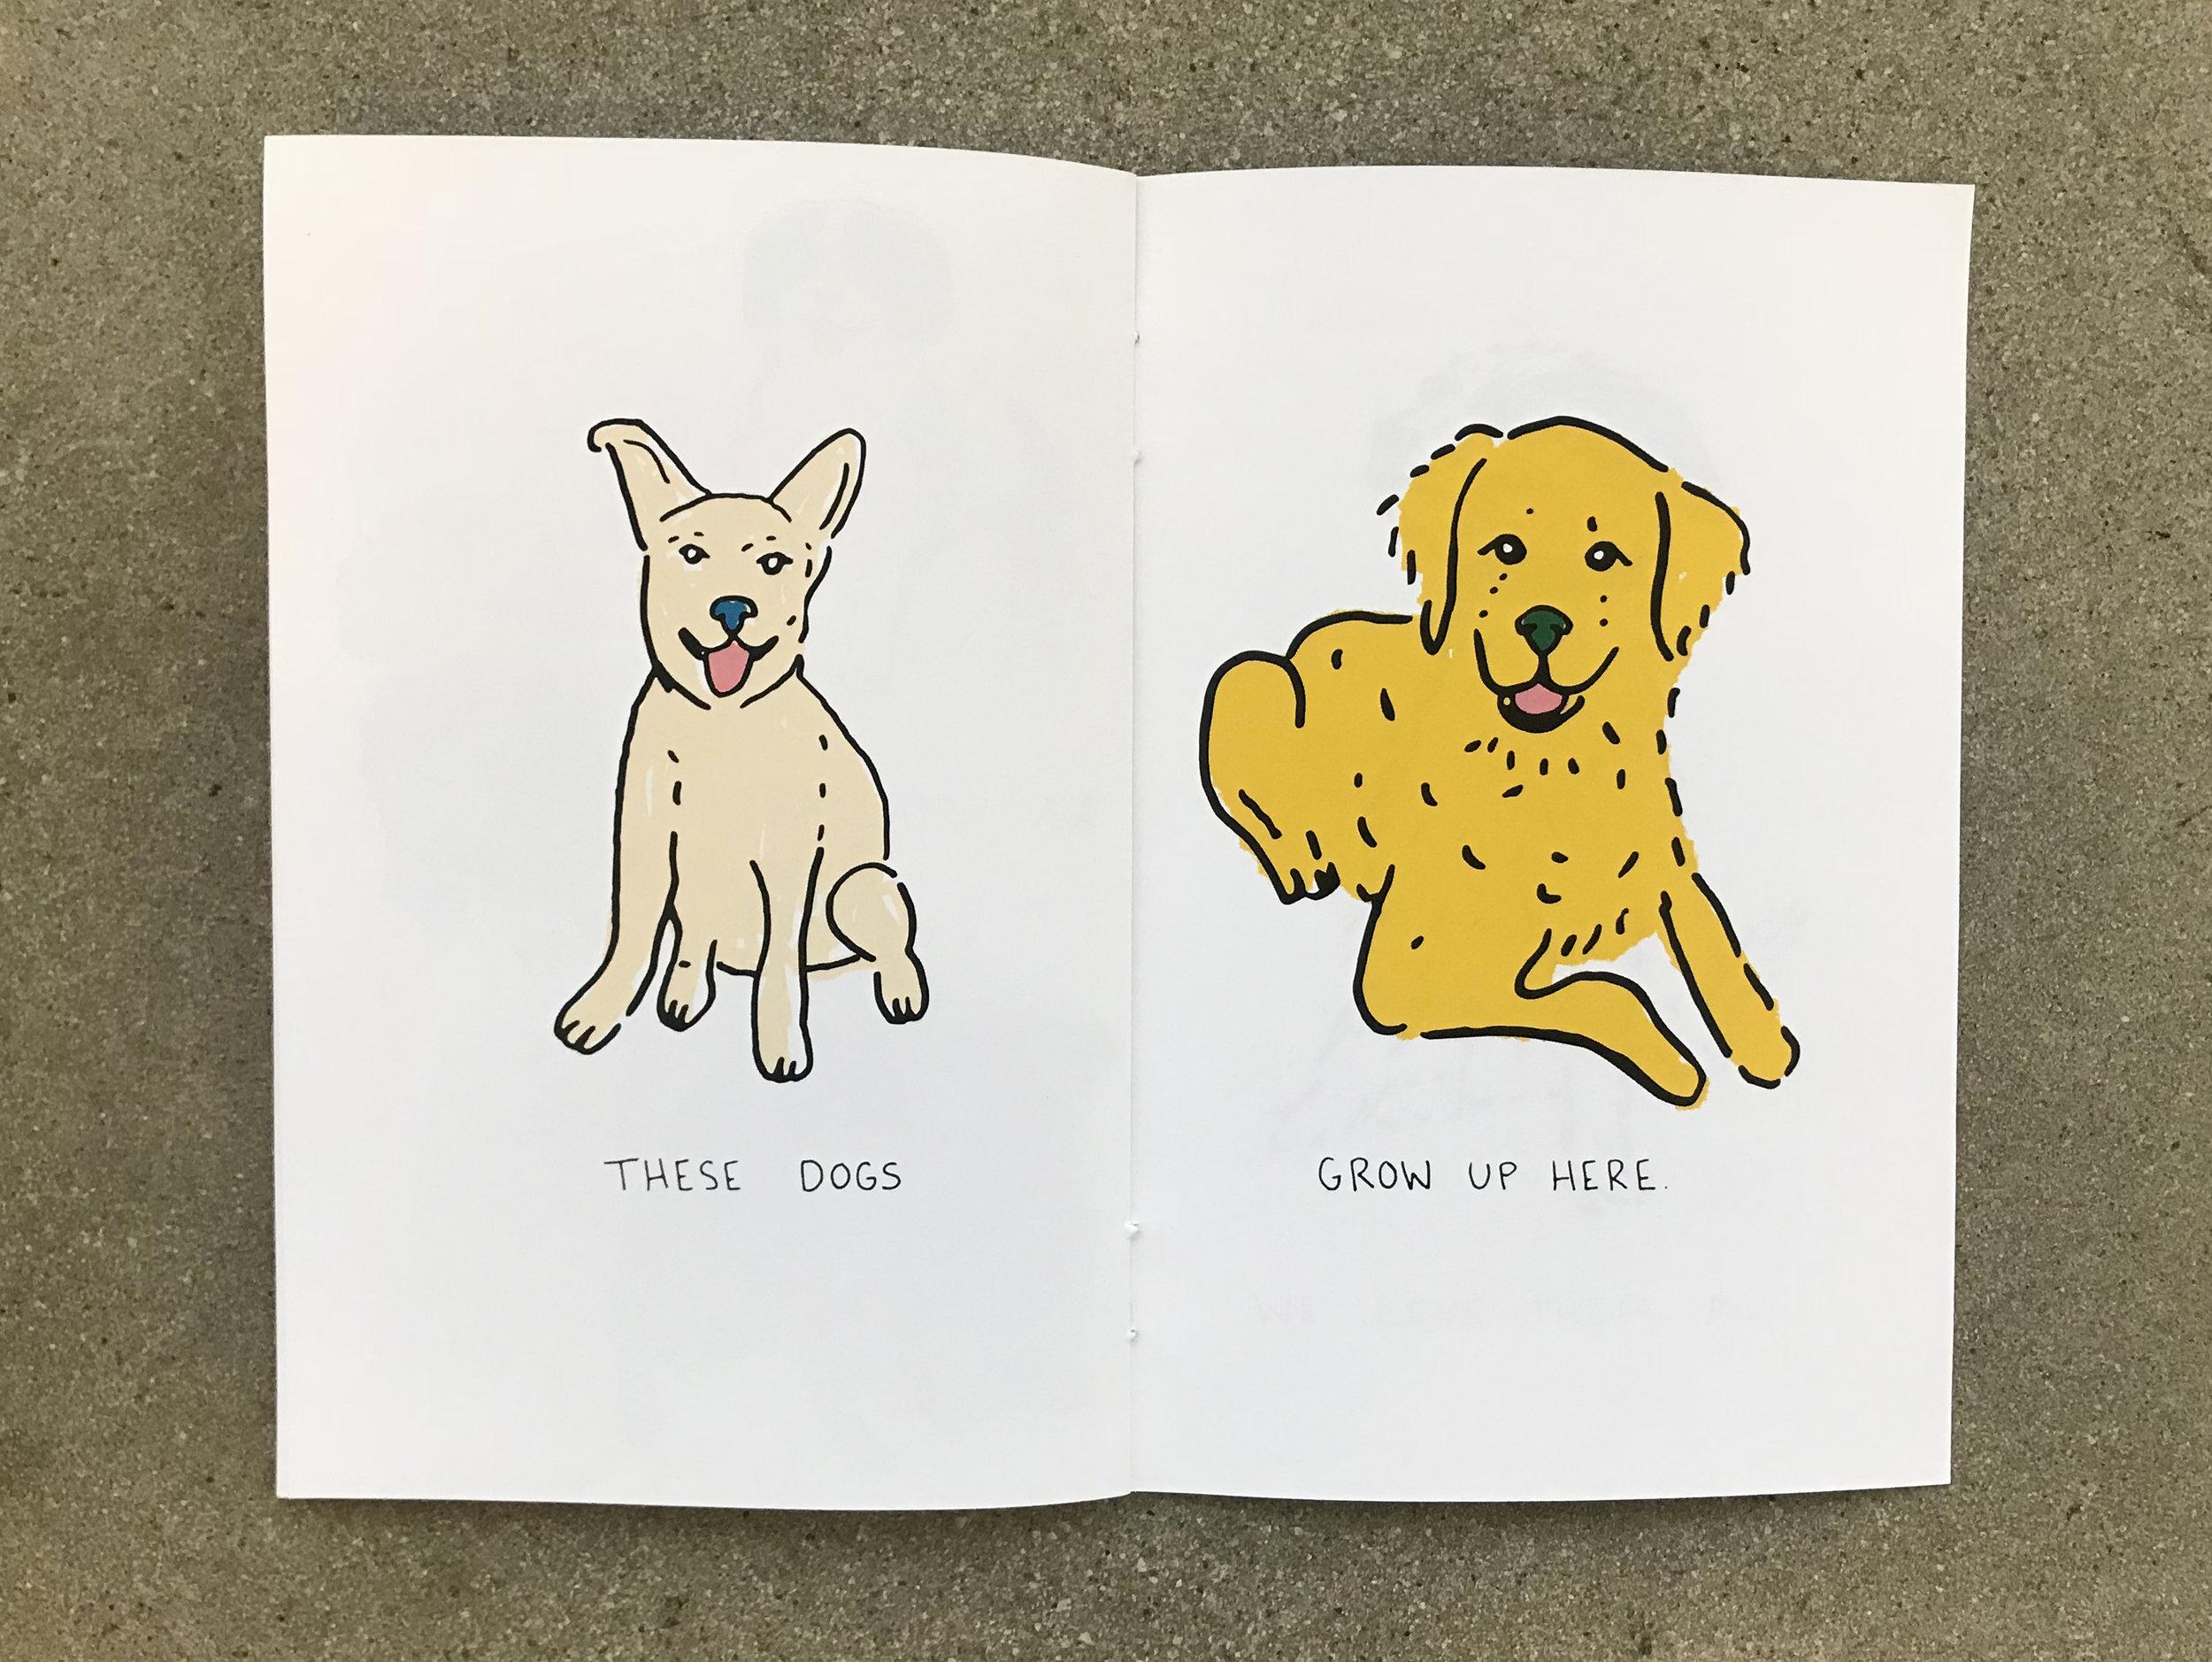 Dogs_0020_19.jpg